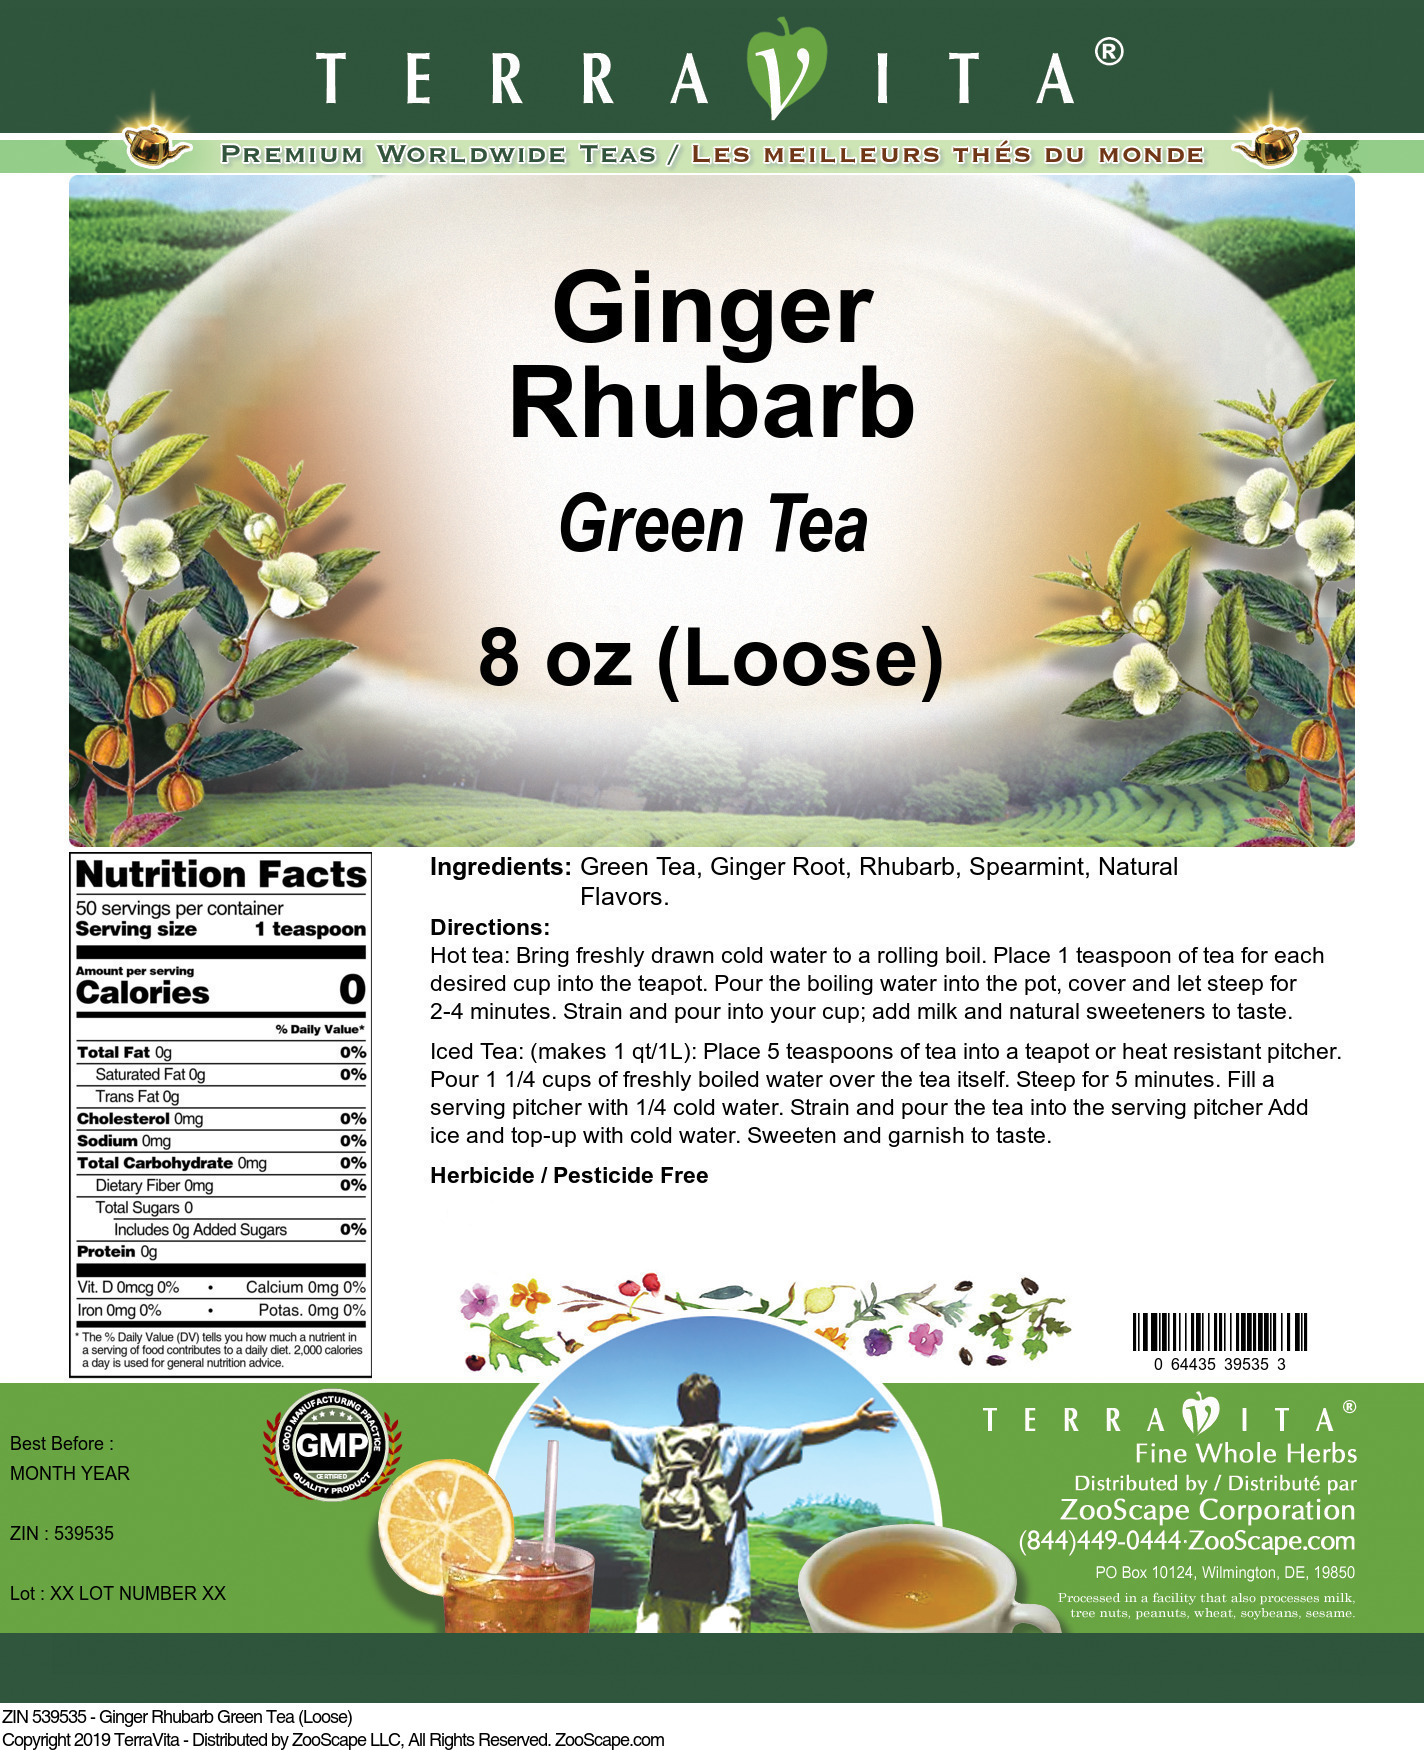 Ginger Rhubarb Green Tea (Loose)